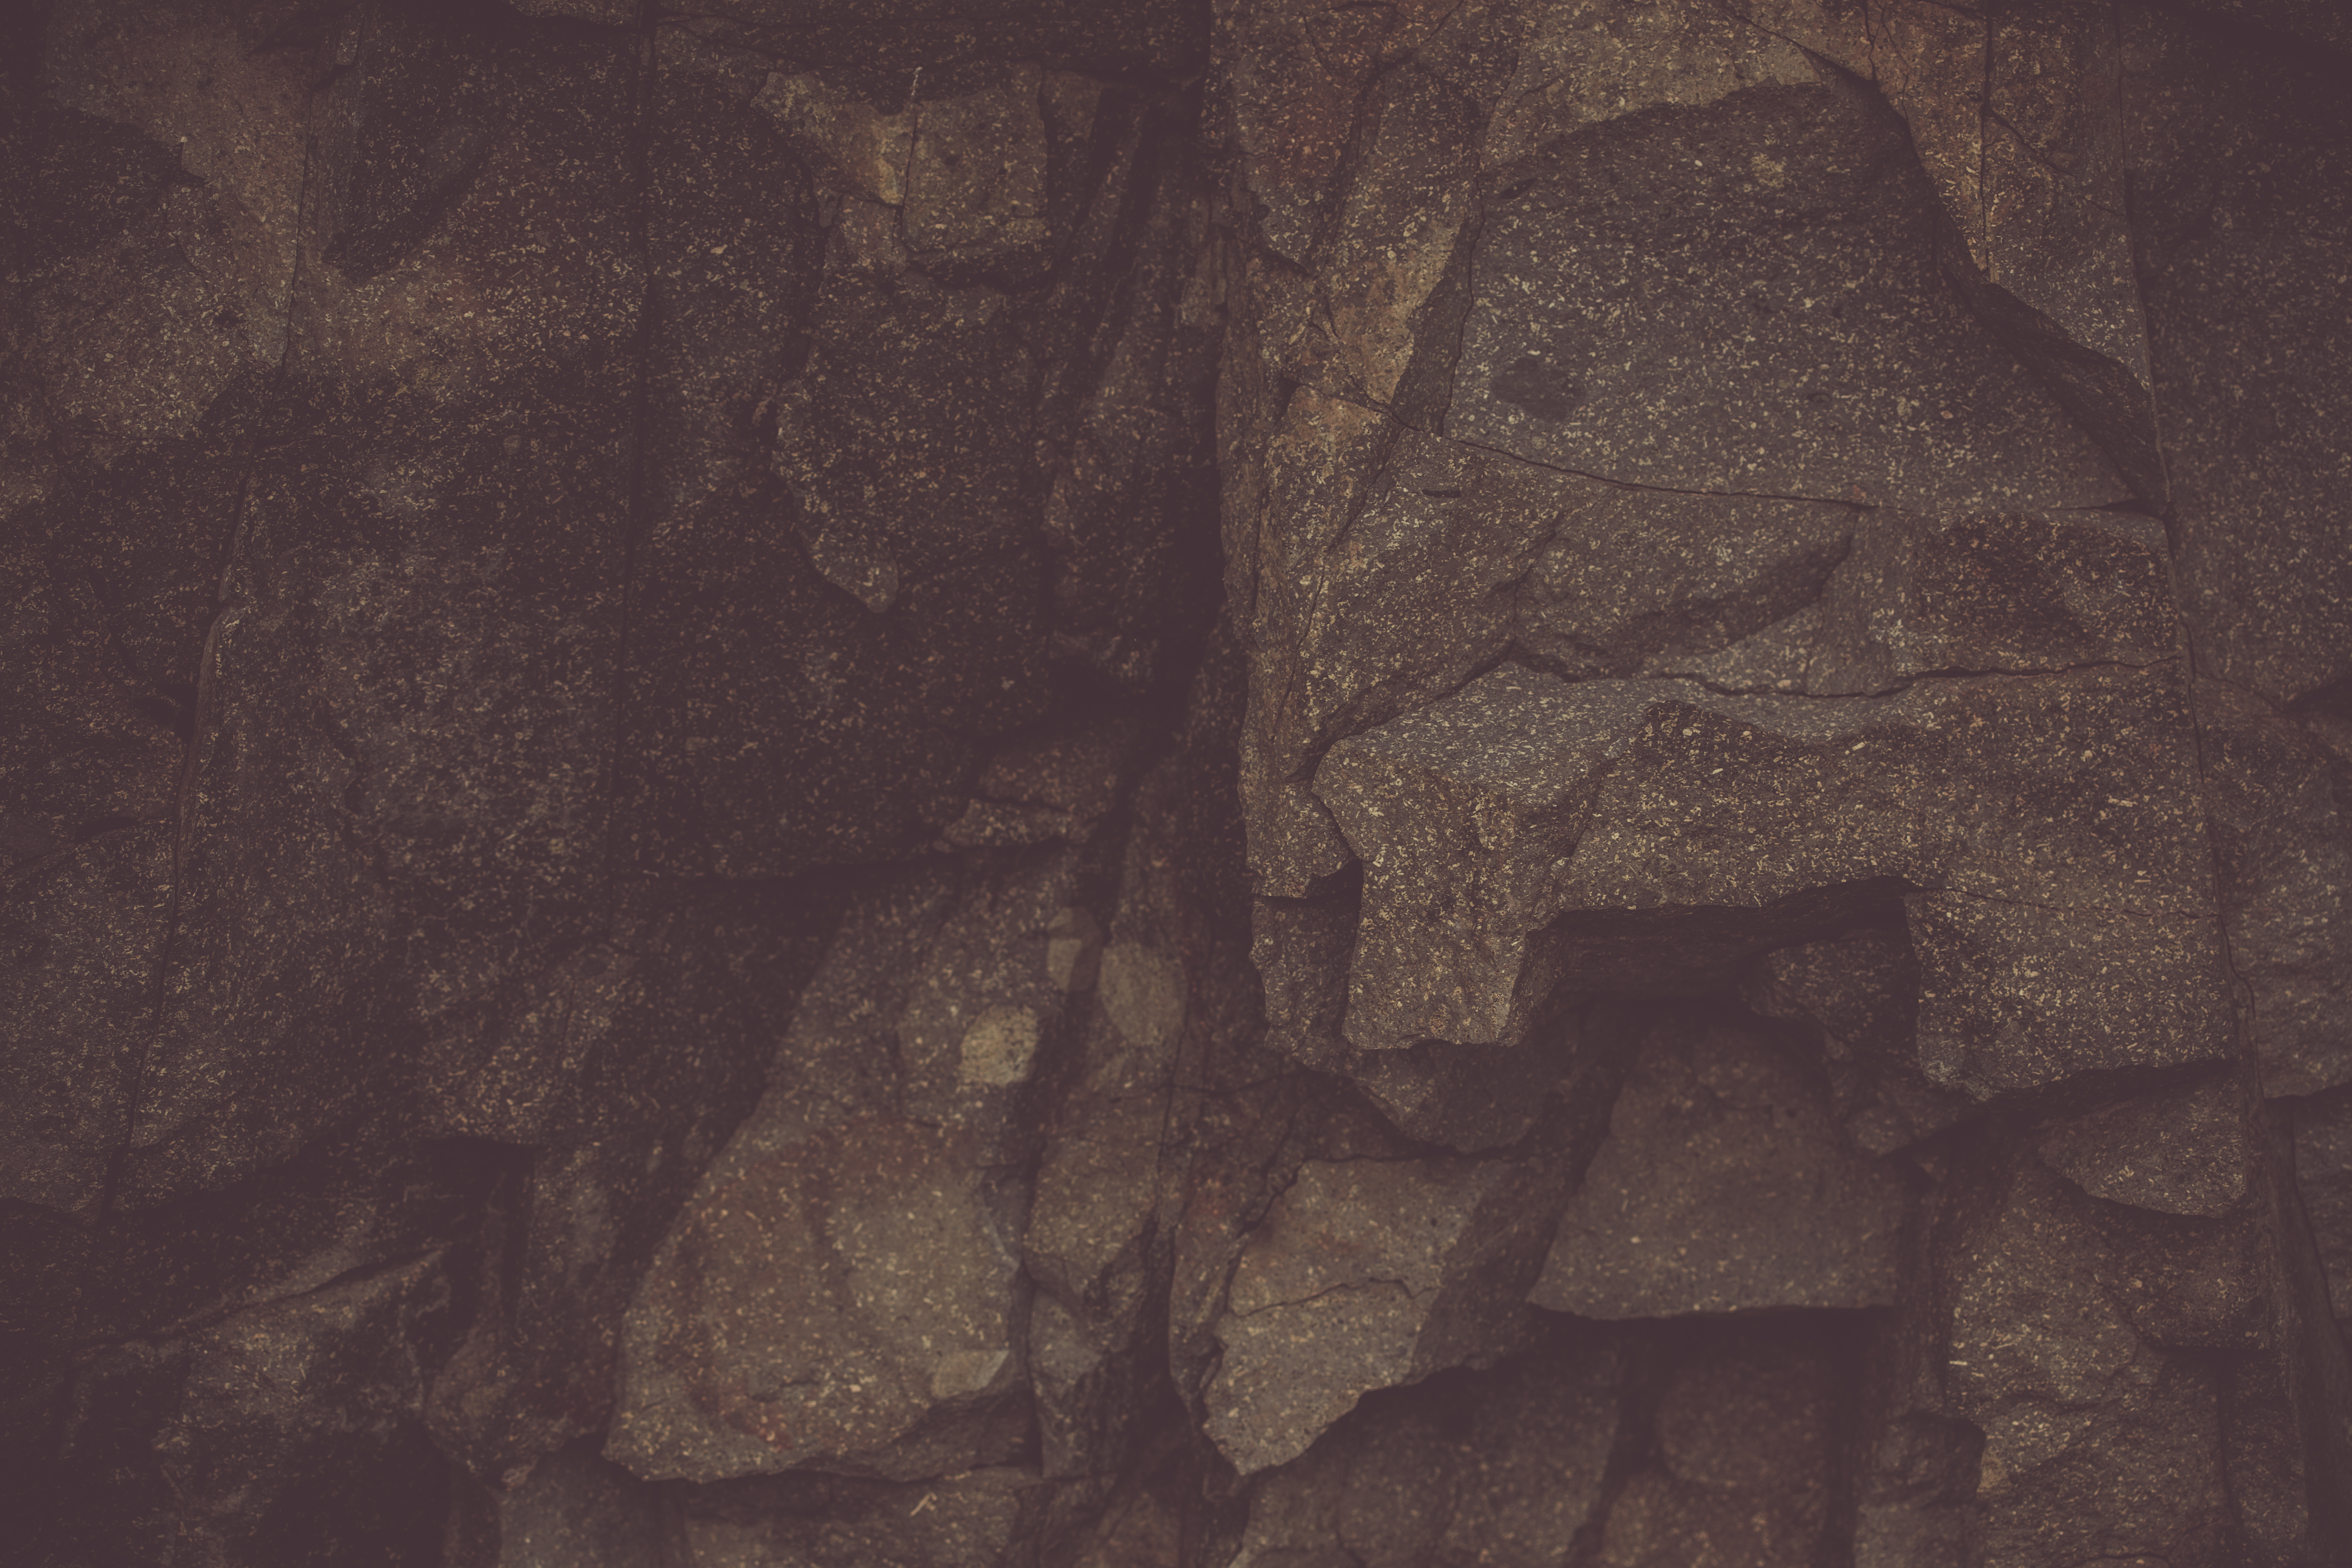 Vintage Basalt Rock Formation, Basalt, Brown, Cliff, Dark, HQ Photo